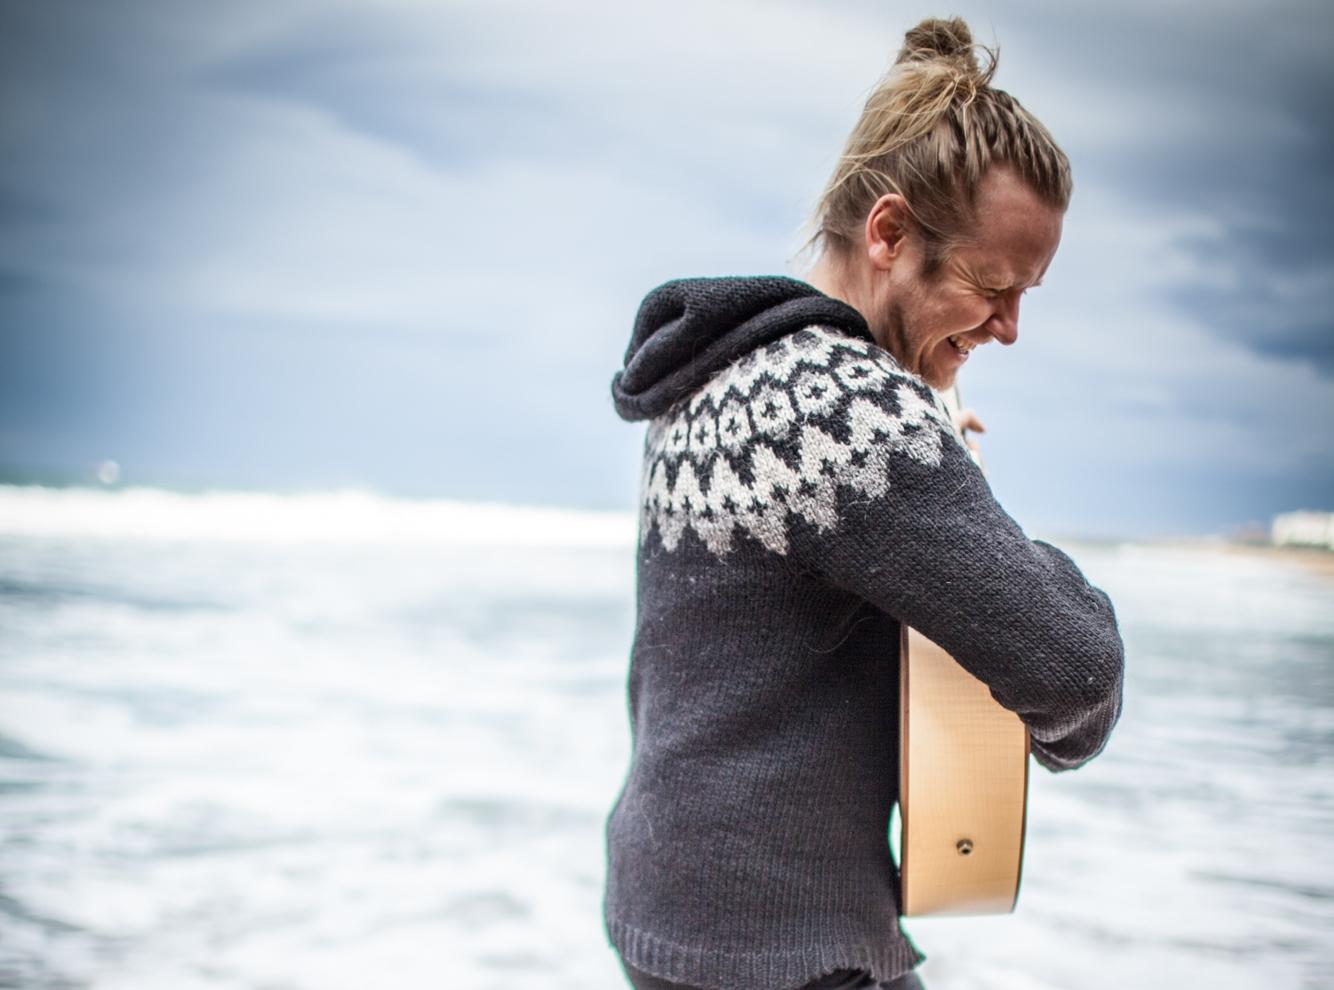 Ragnar_Olafsson_-_promo_foto_-_duze